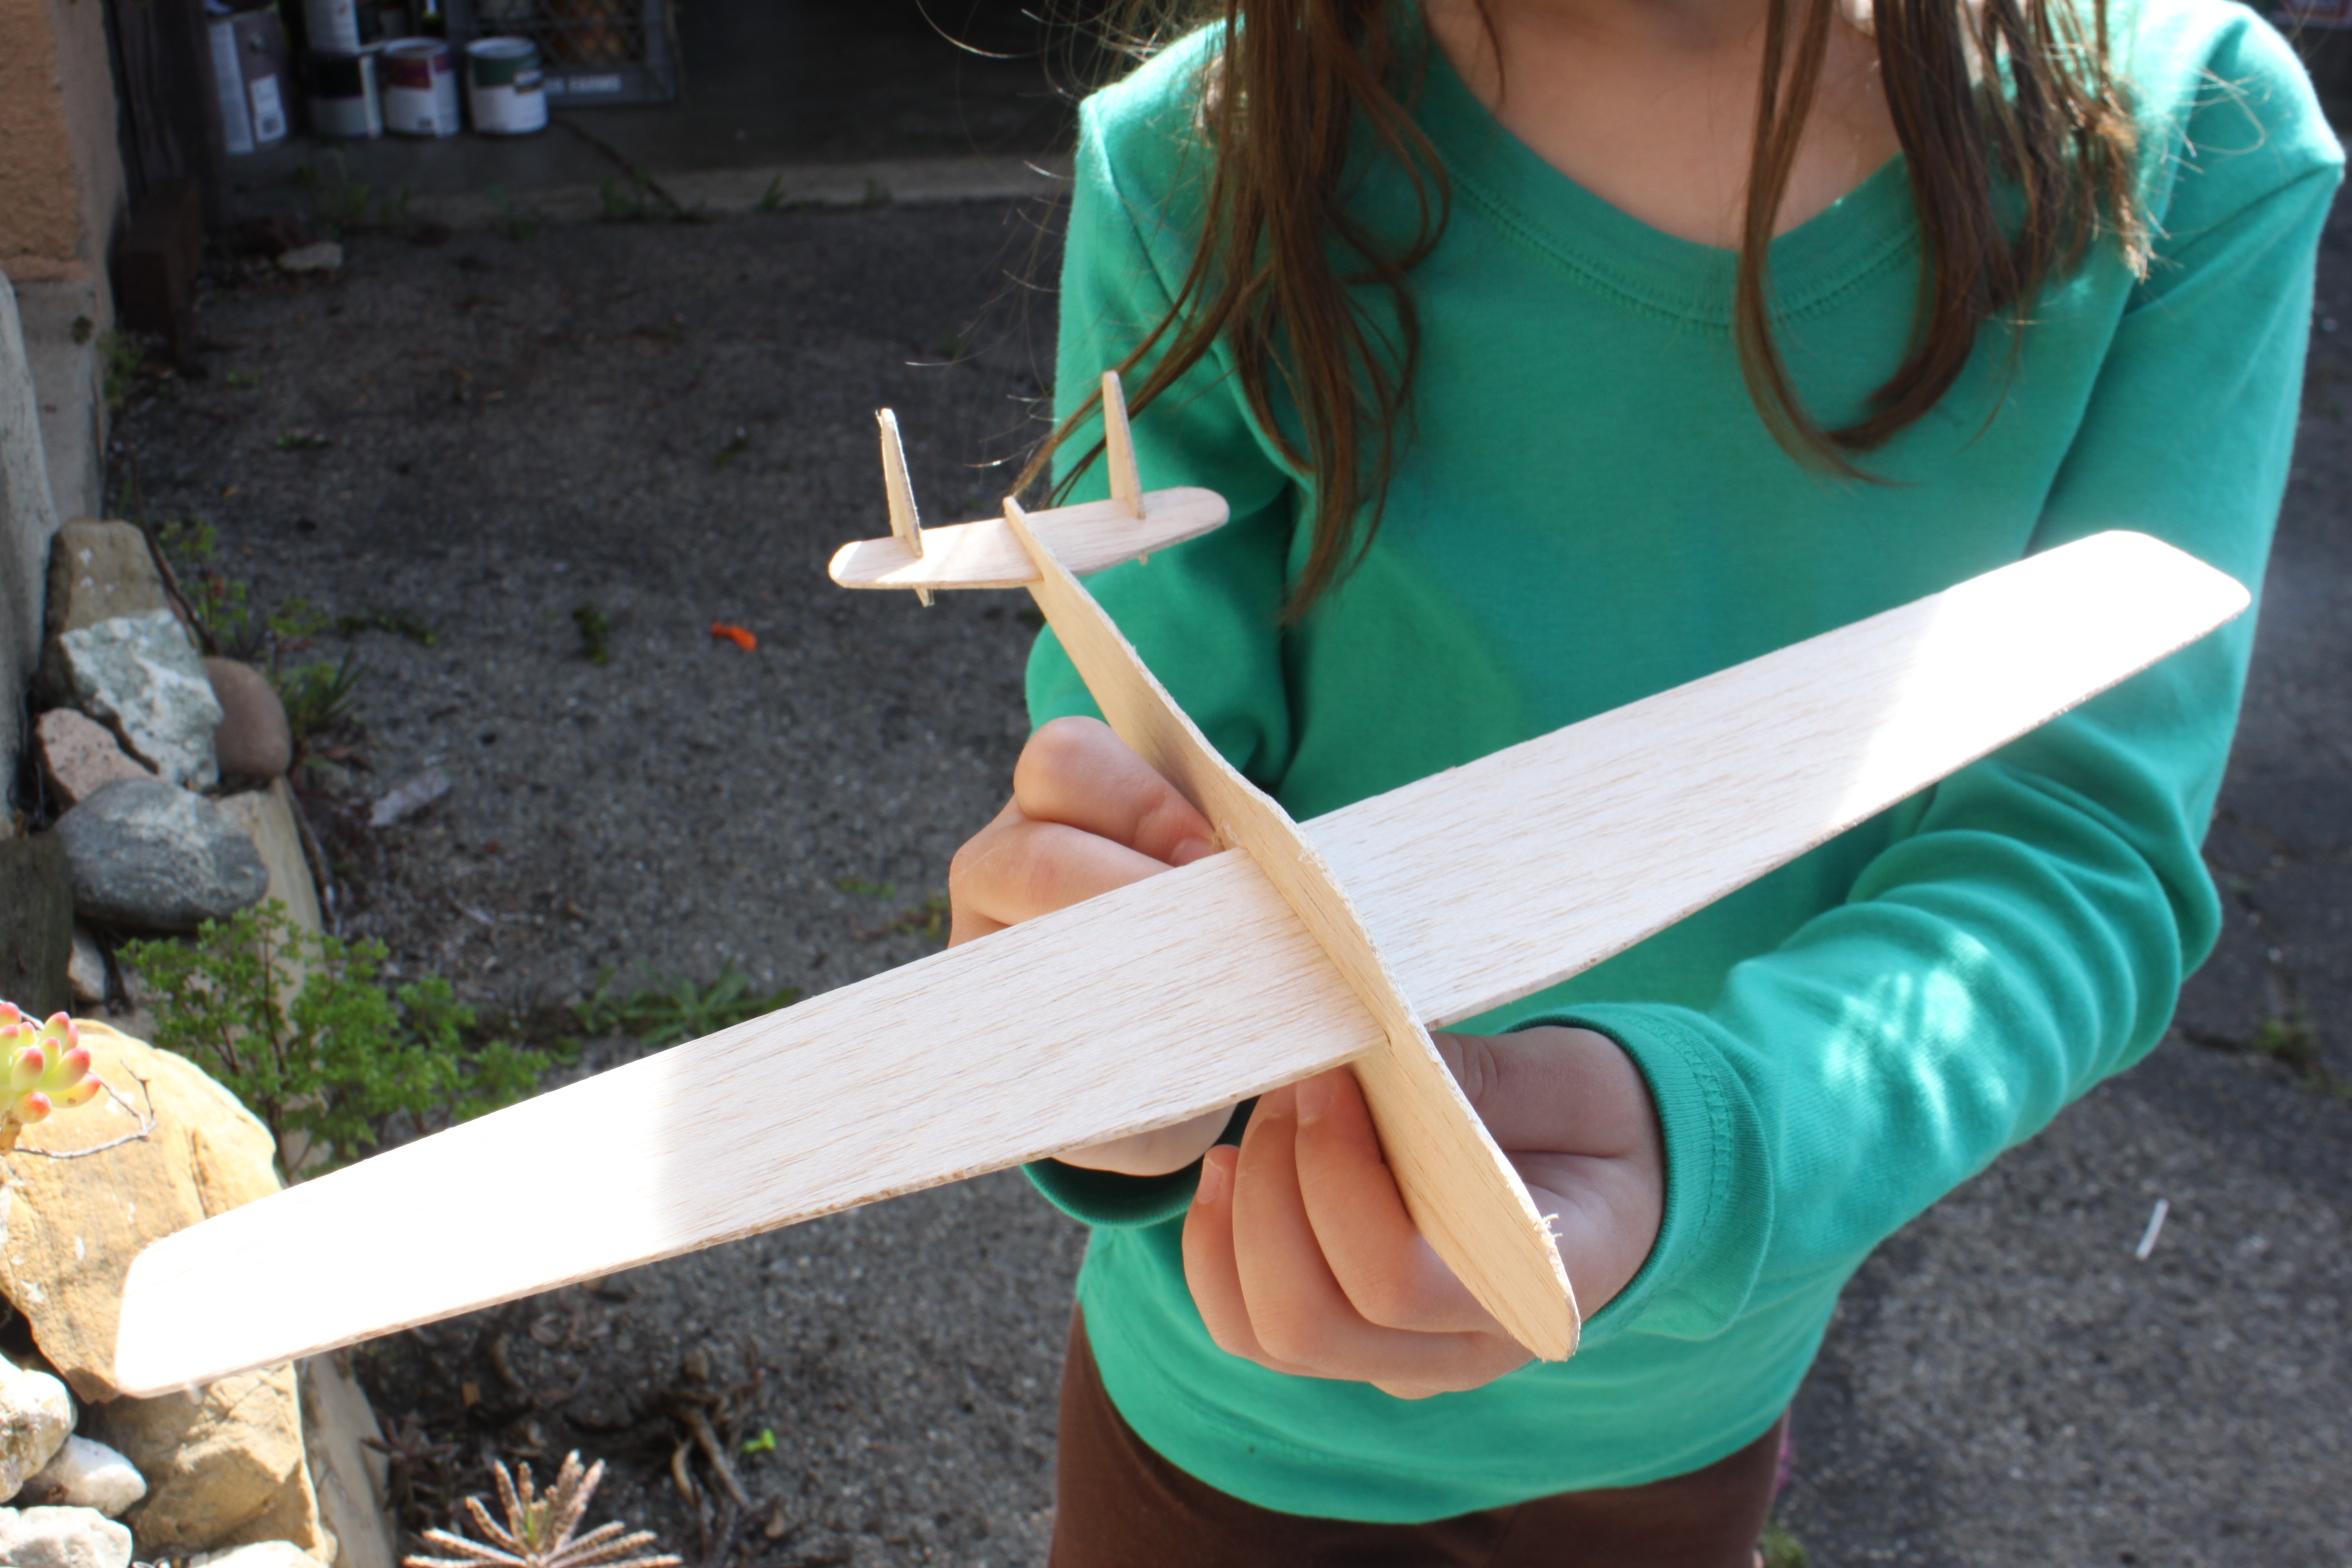 Diy Pattern For A Balsa Wood Glider Plane Plans Pdf